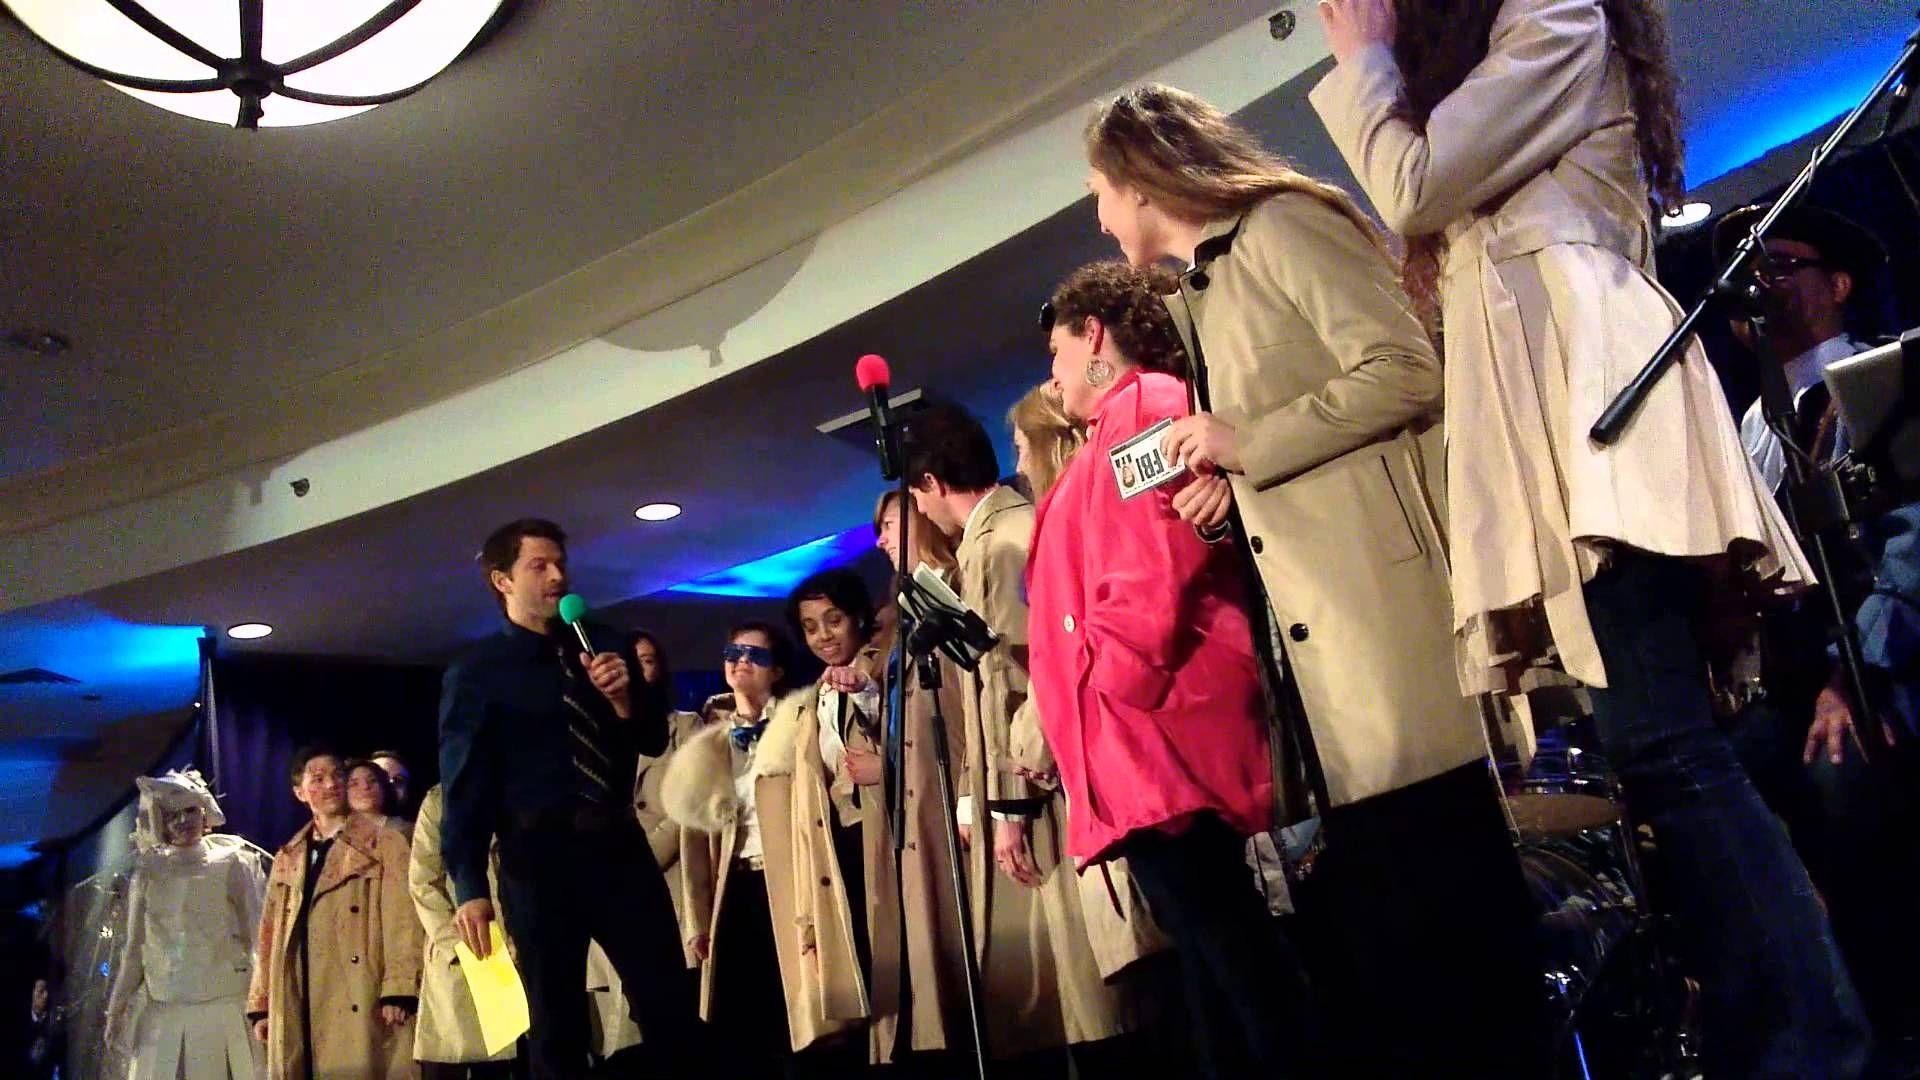 Misha Collins judges the Castiel cosplay at DCcon 2014